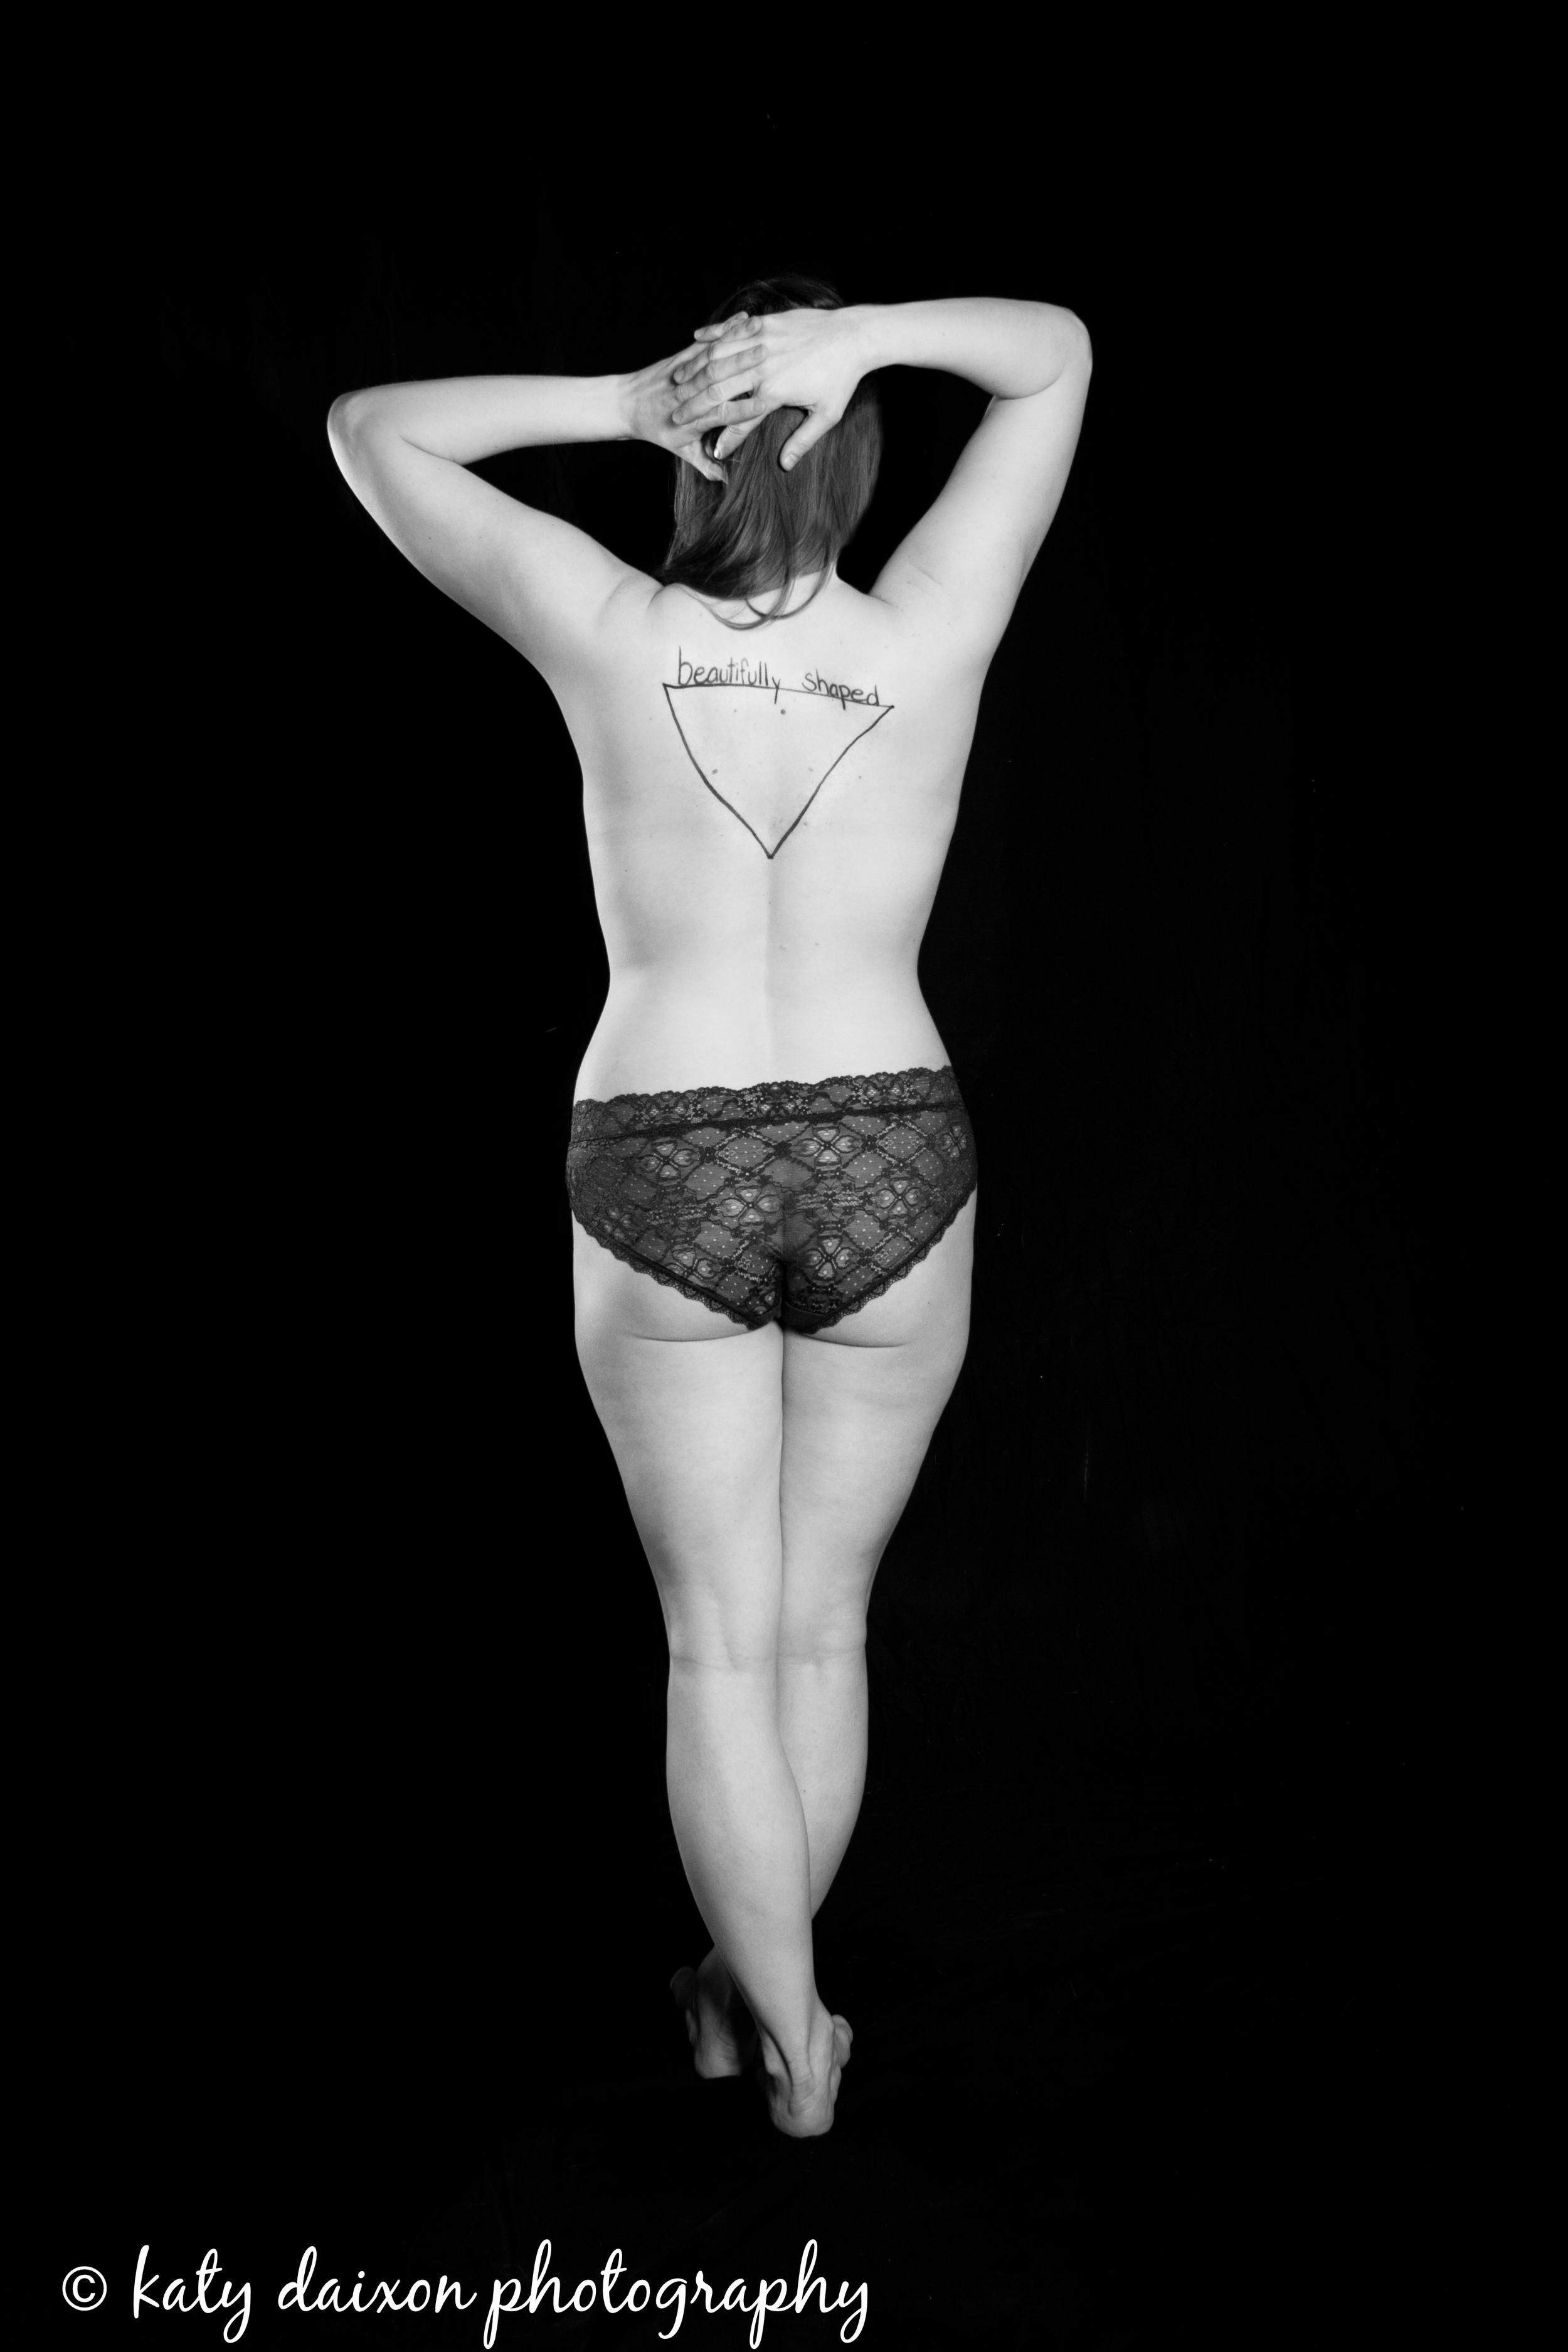 the-body-project-katy-daixon-photography-55.jpg